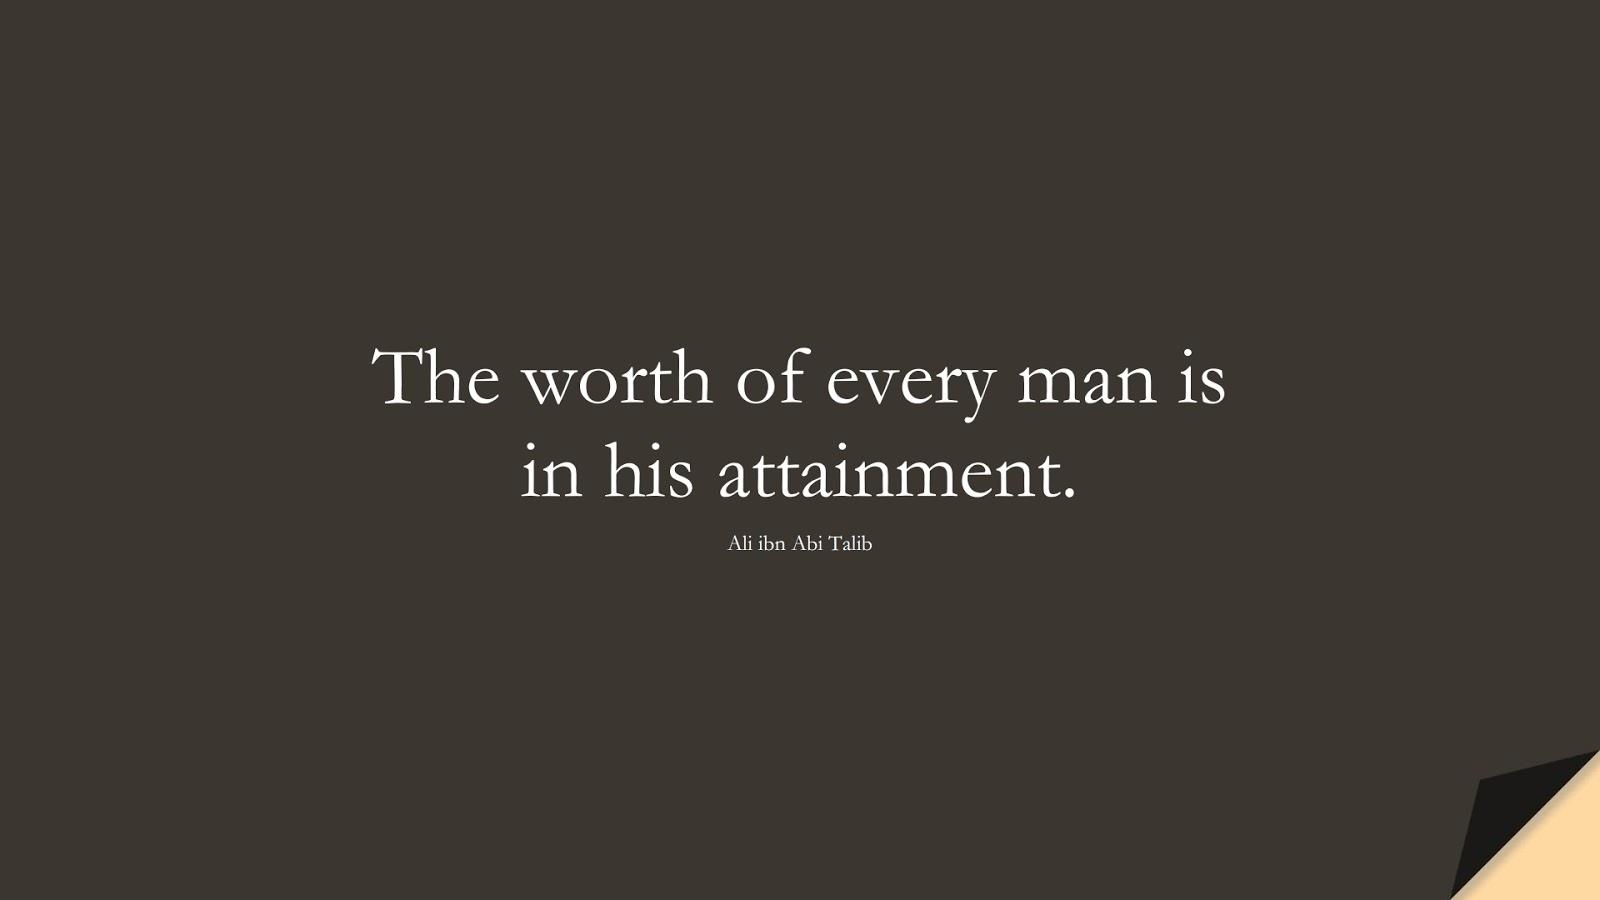 The worth of every man is in his attainment. (Ali ibn Abi Talib);  #AliQuotes